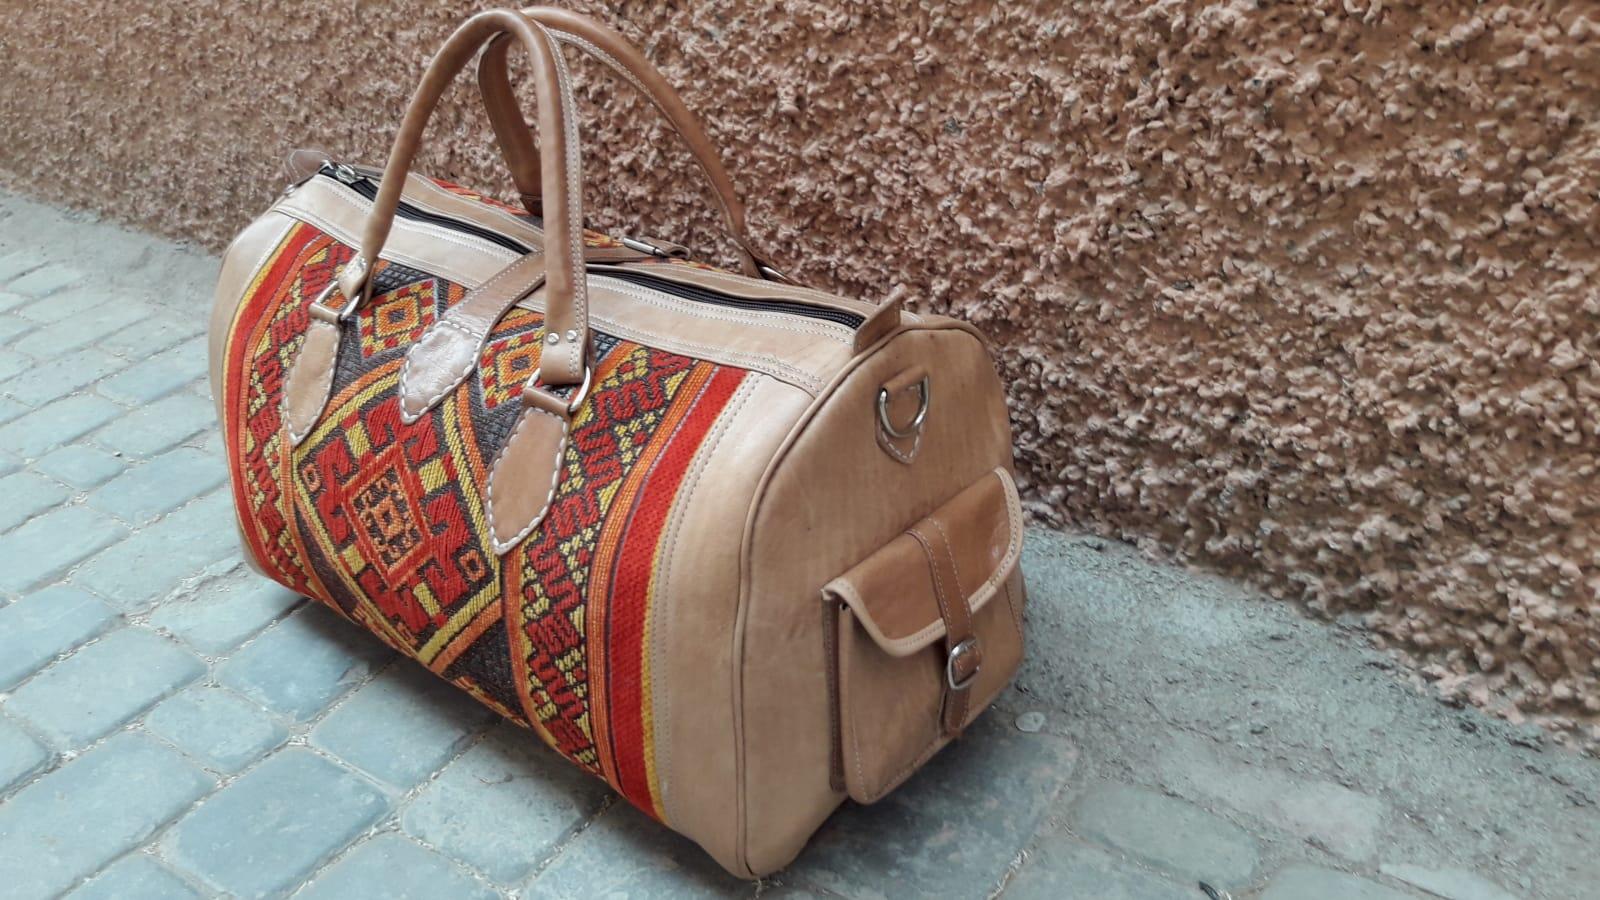 bag leather and Sabra silk Red, Yellow Morocco